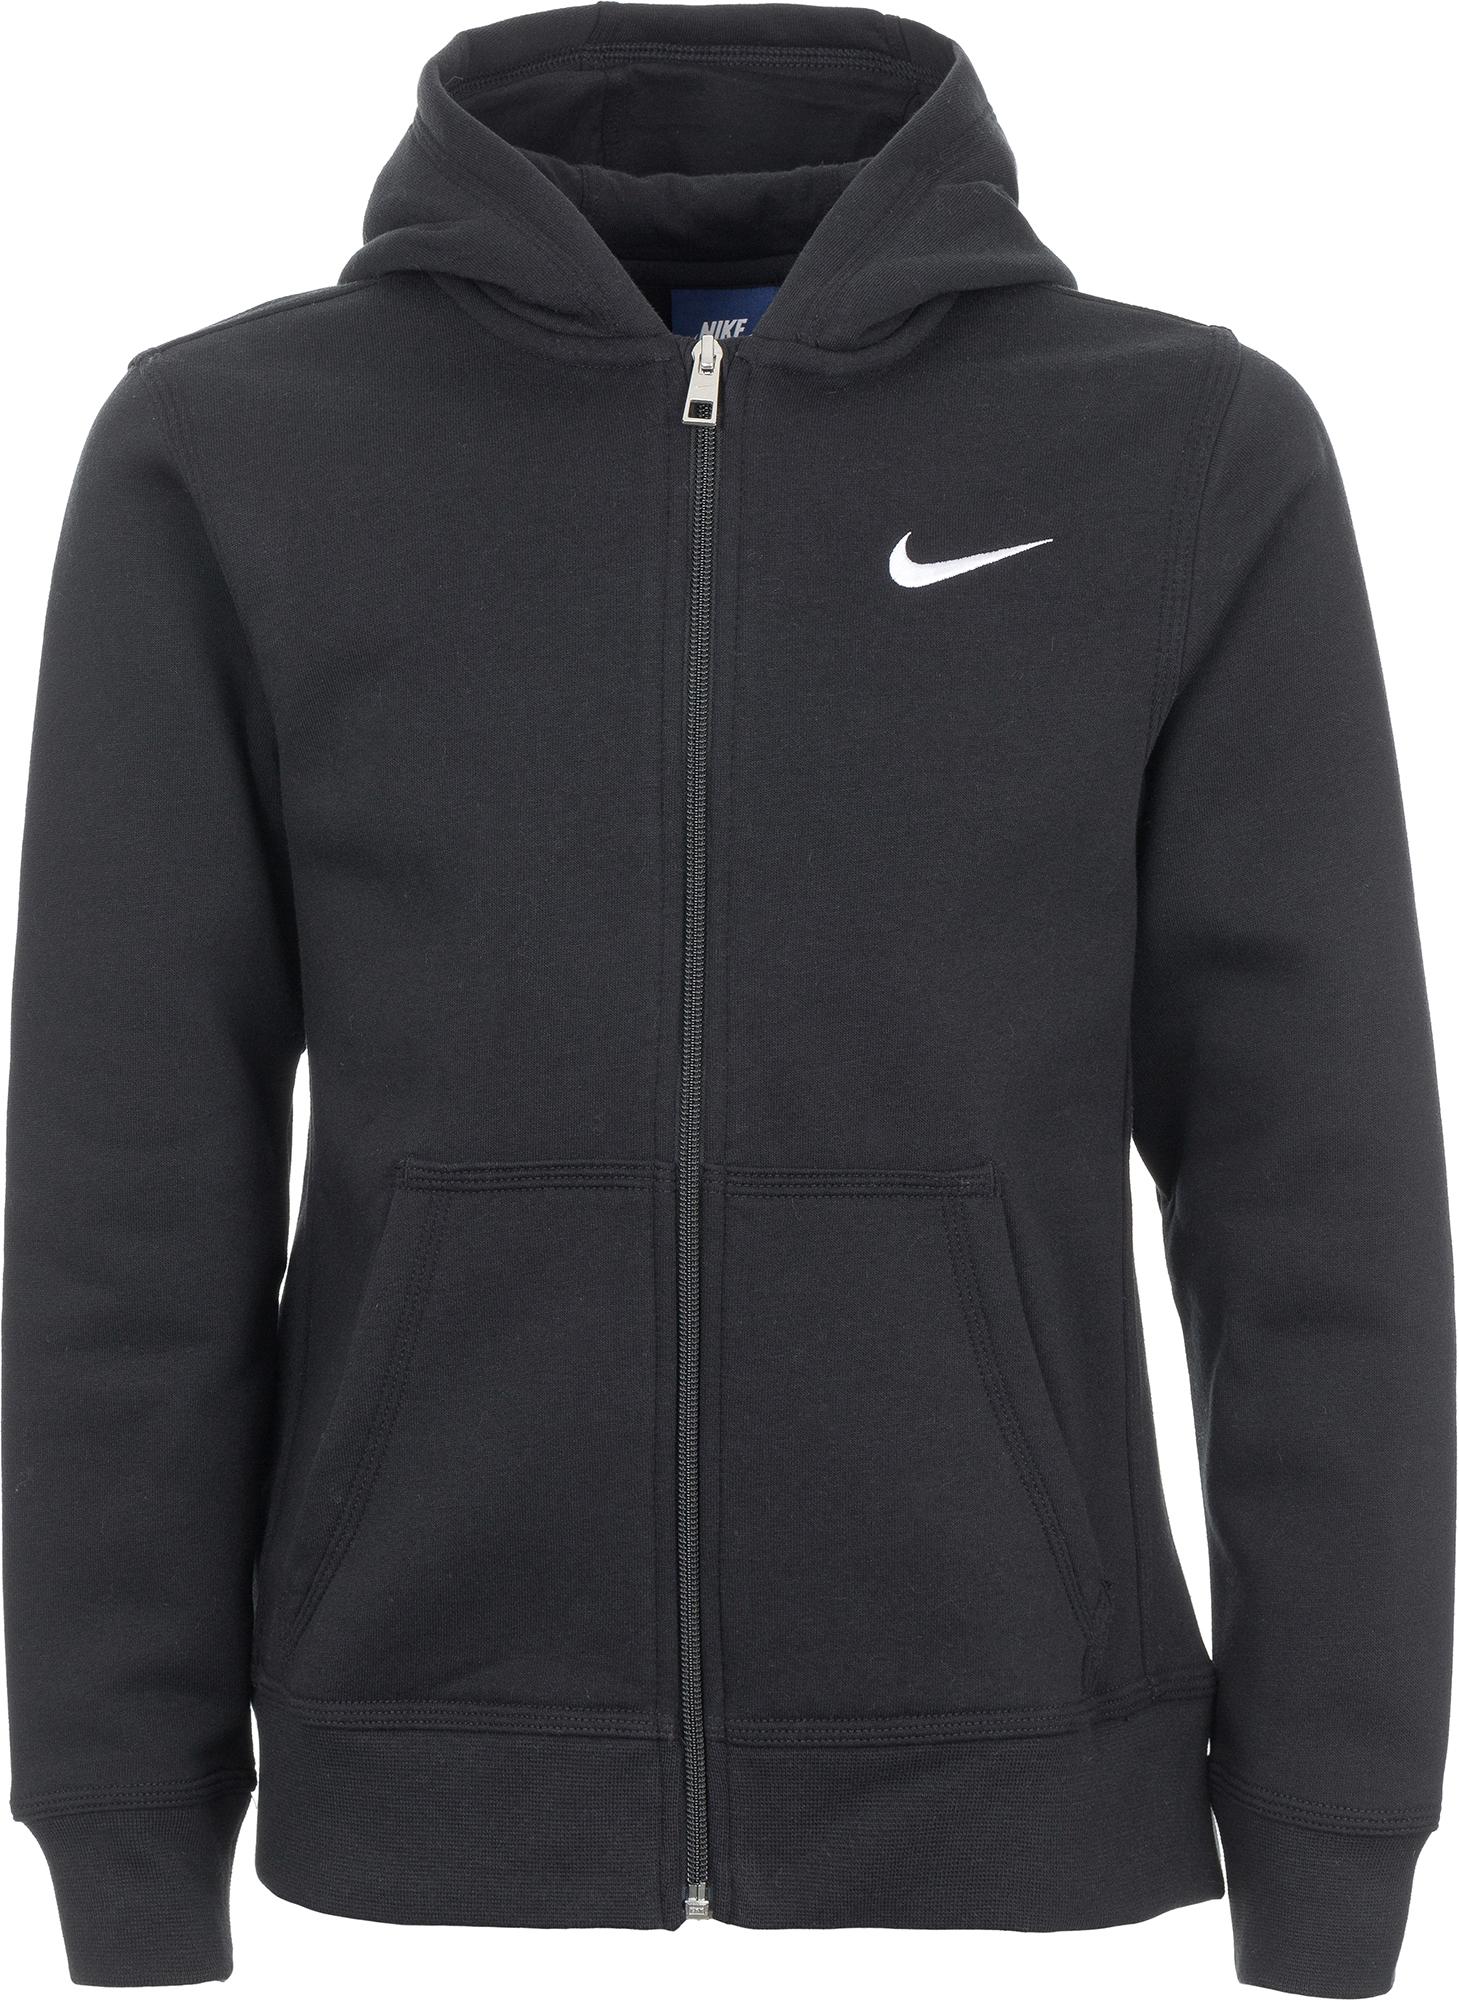 Nike Джемпер для мальчиков Nike Sportswear, размер 158-170